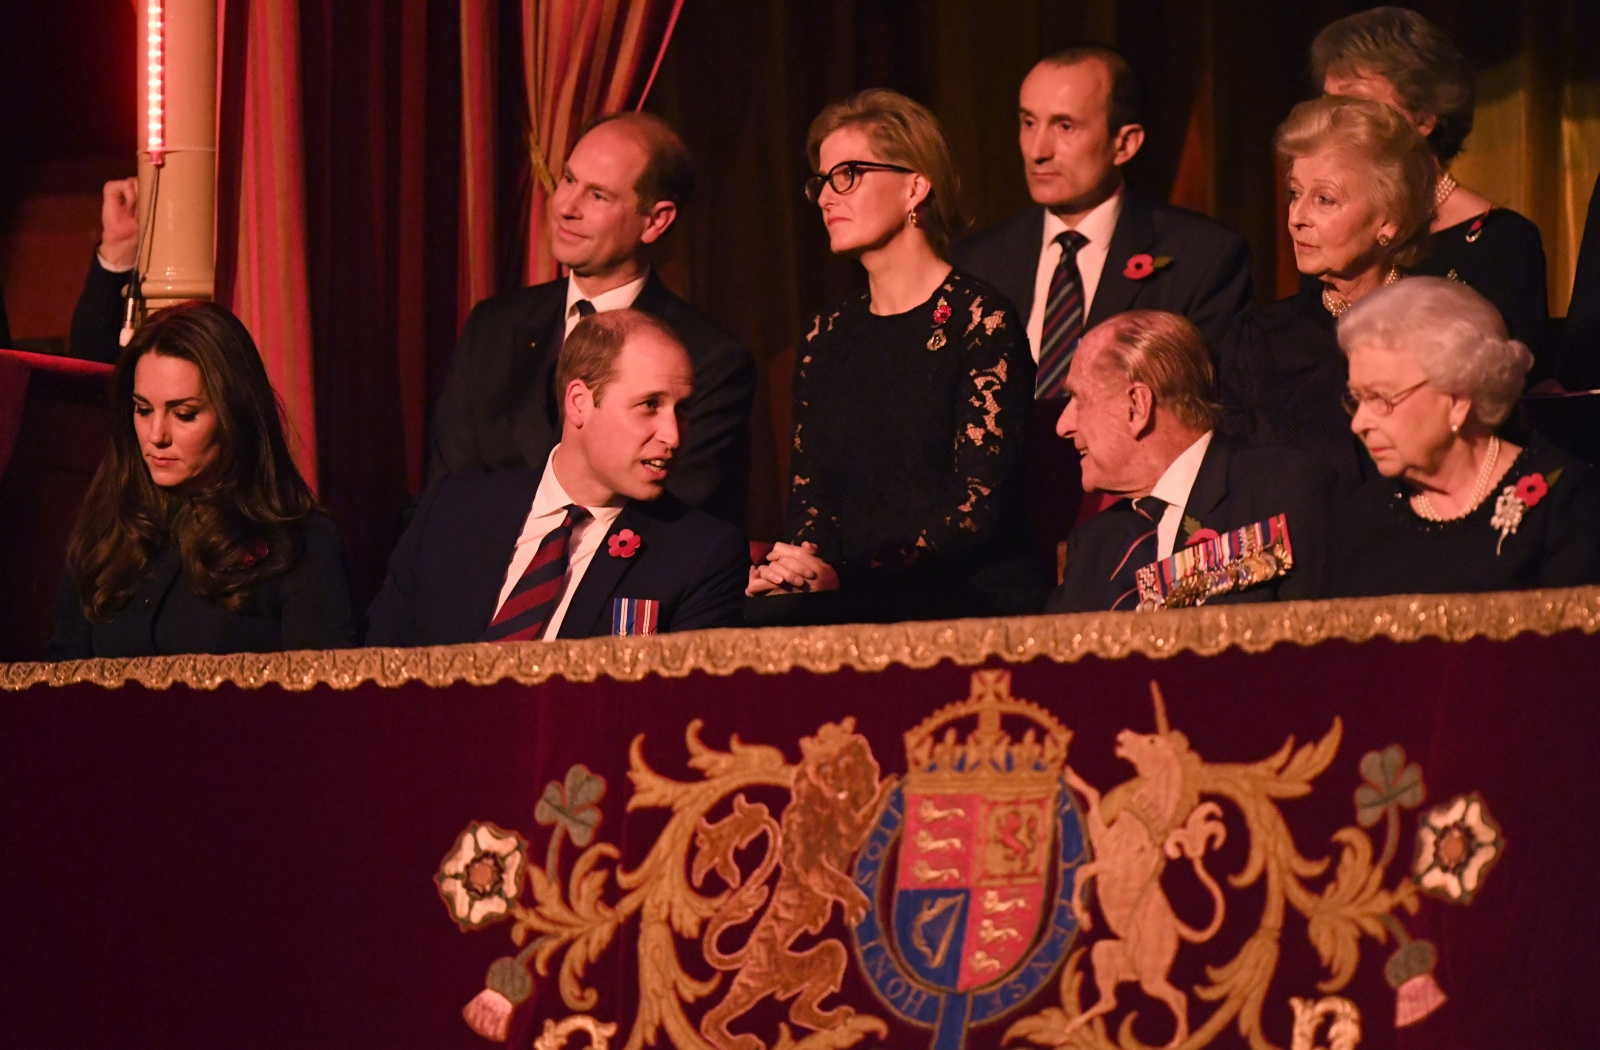 British Royal Family: Prince Charles's birthday and William